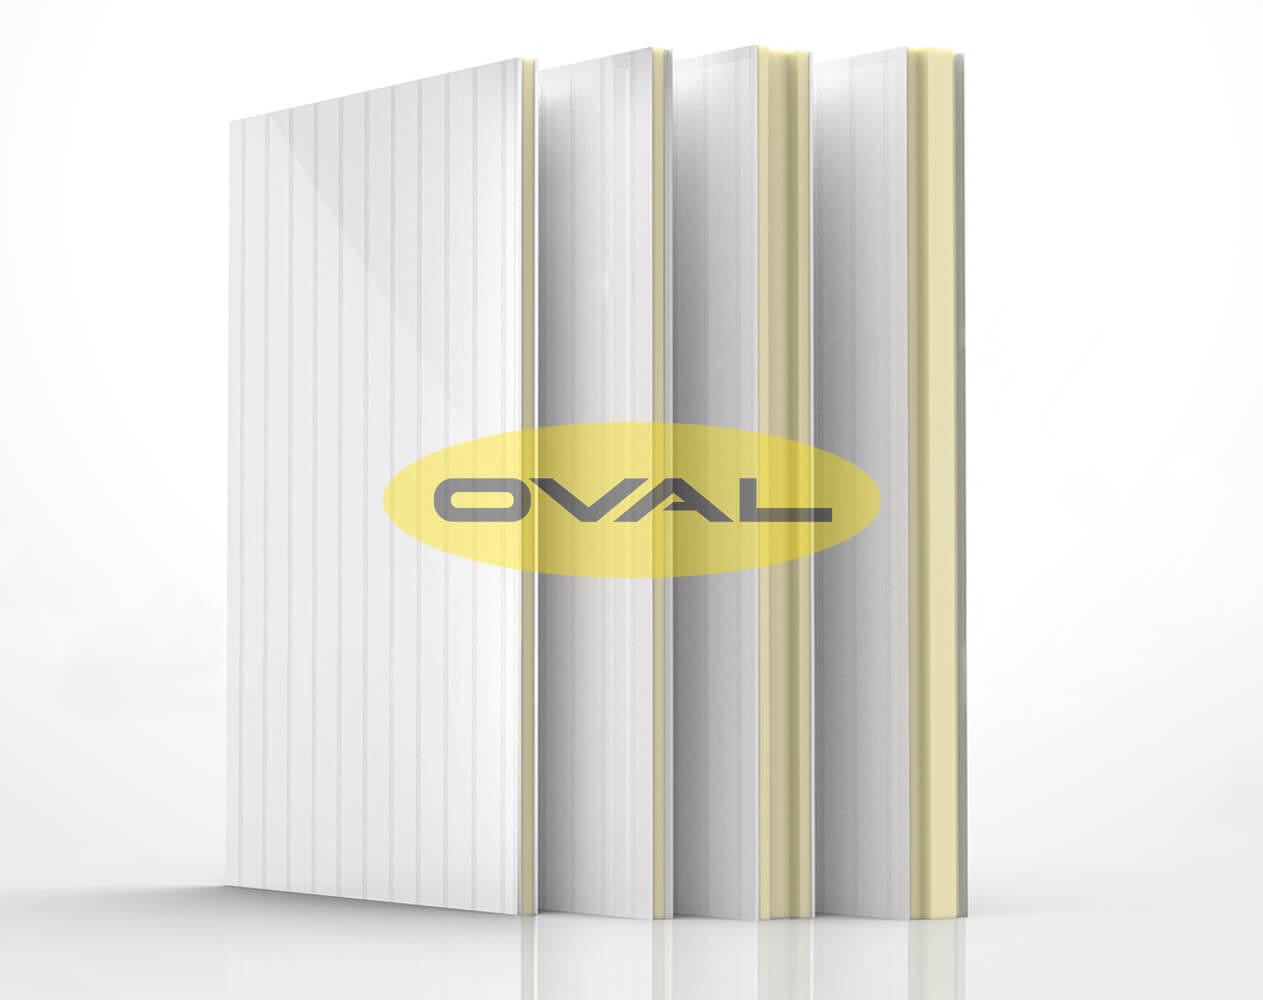 Tấm Panel PU do Oval sản xuất